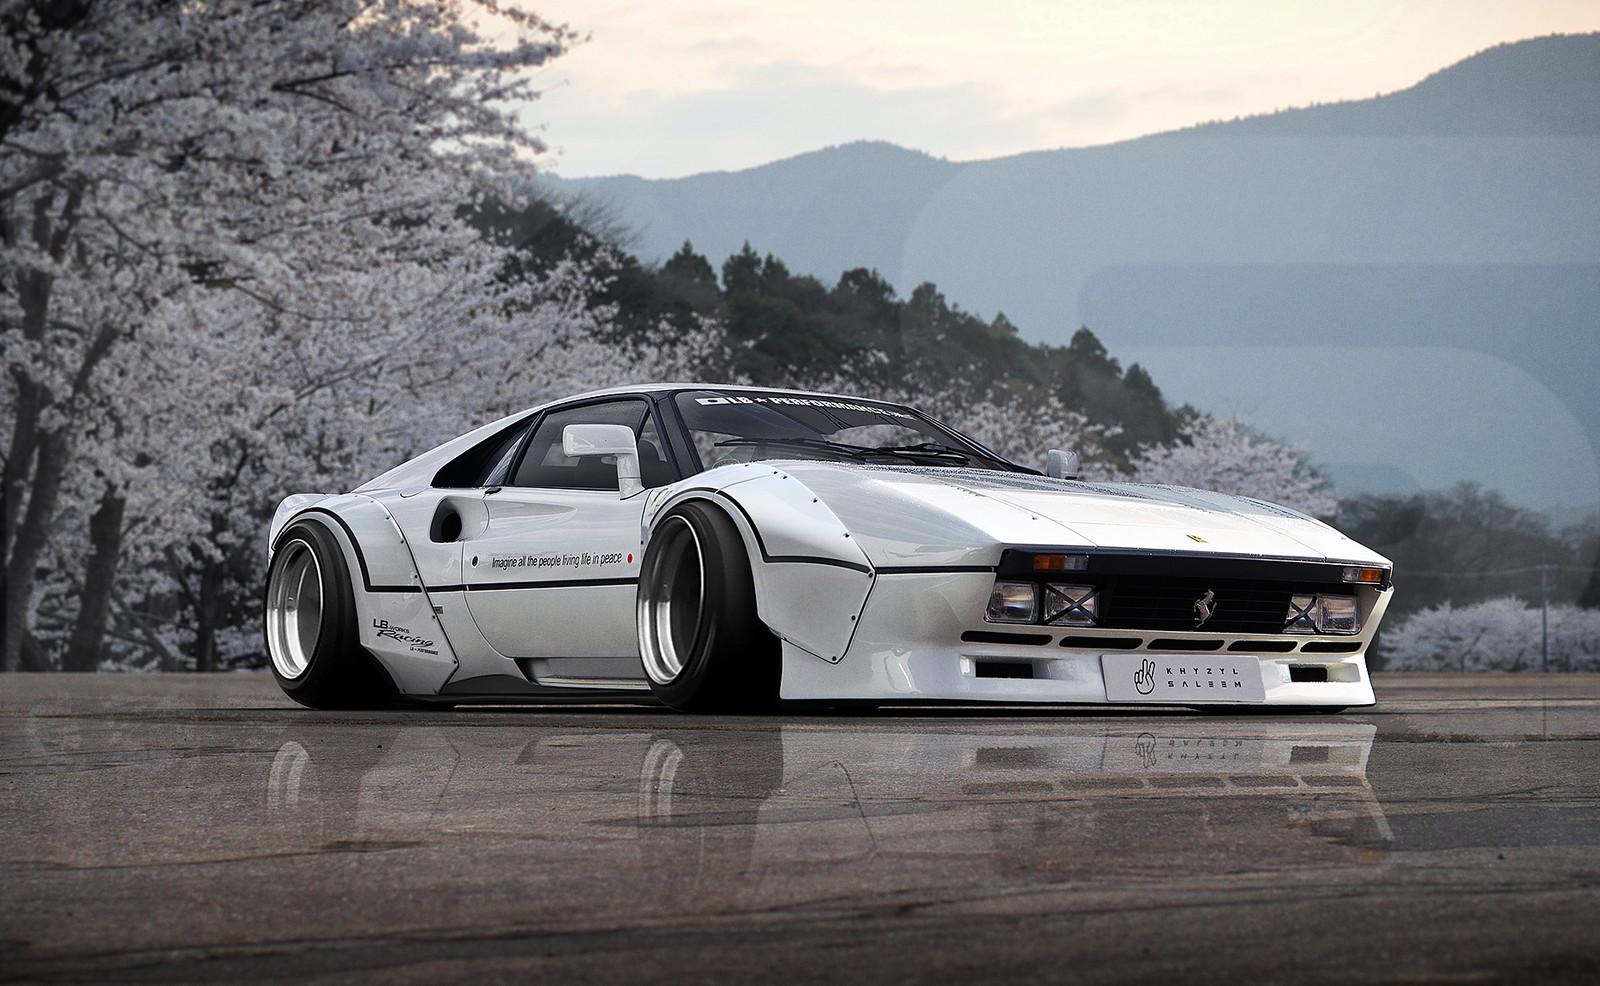 LBW 288 GTO